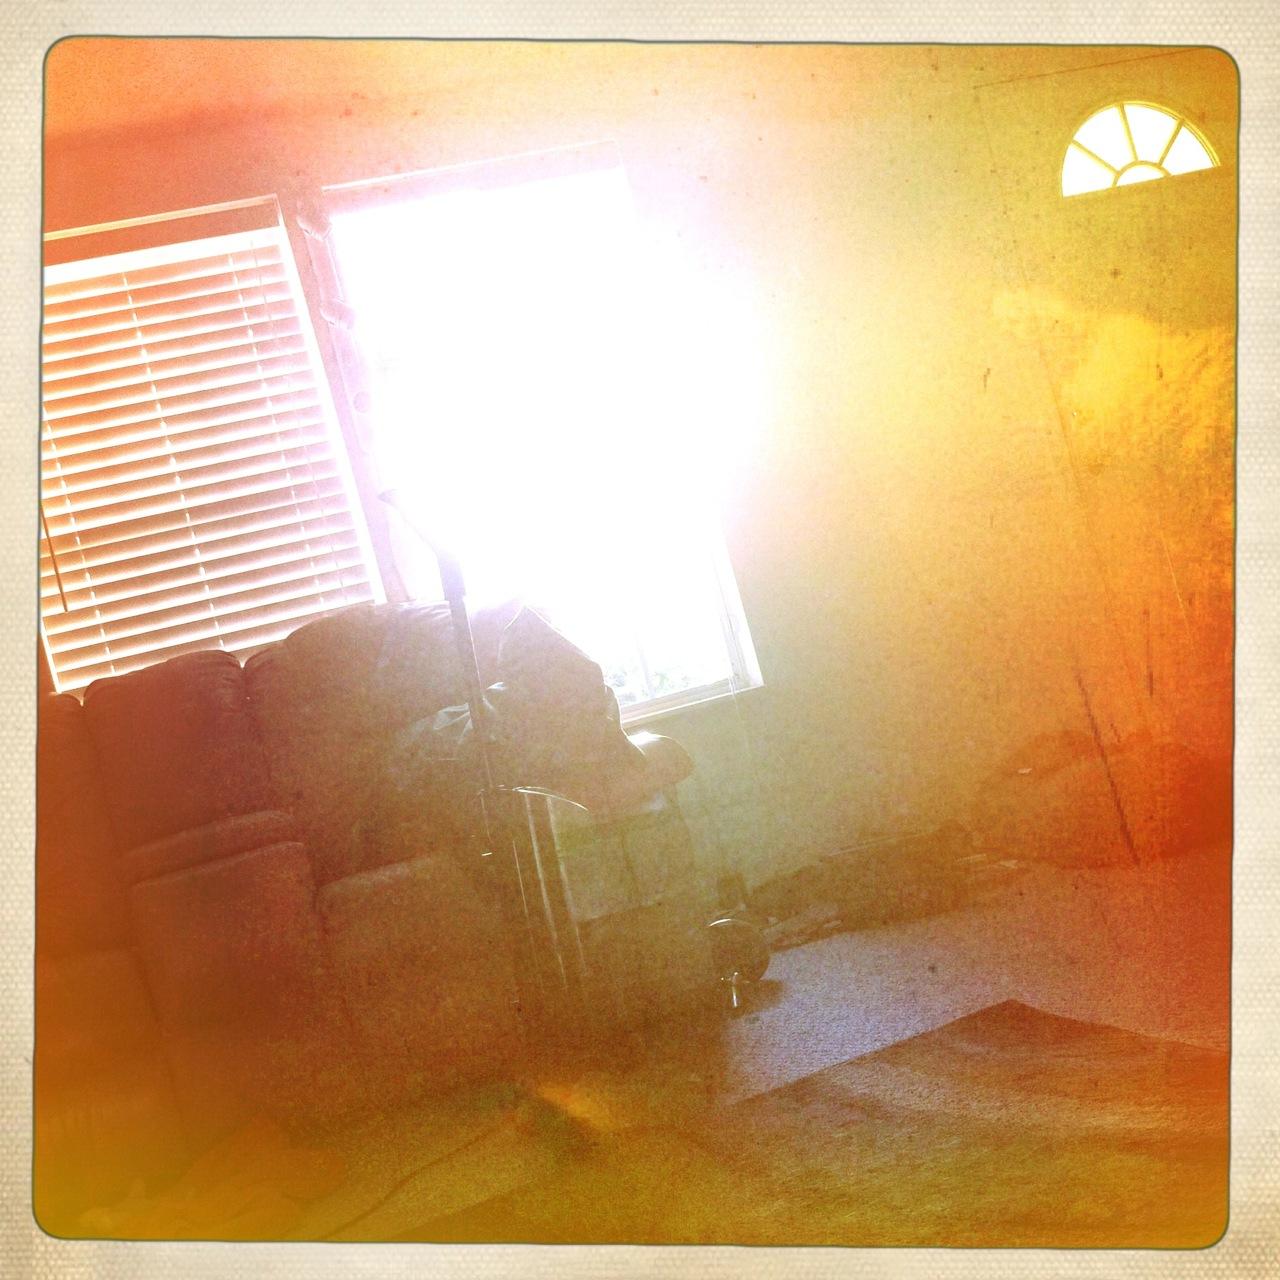 Morning sunrise 1 Buckhorst H1 Lens, Ina's 1969 Film, Cherry Shine Flash,